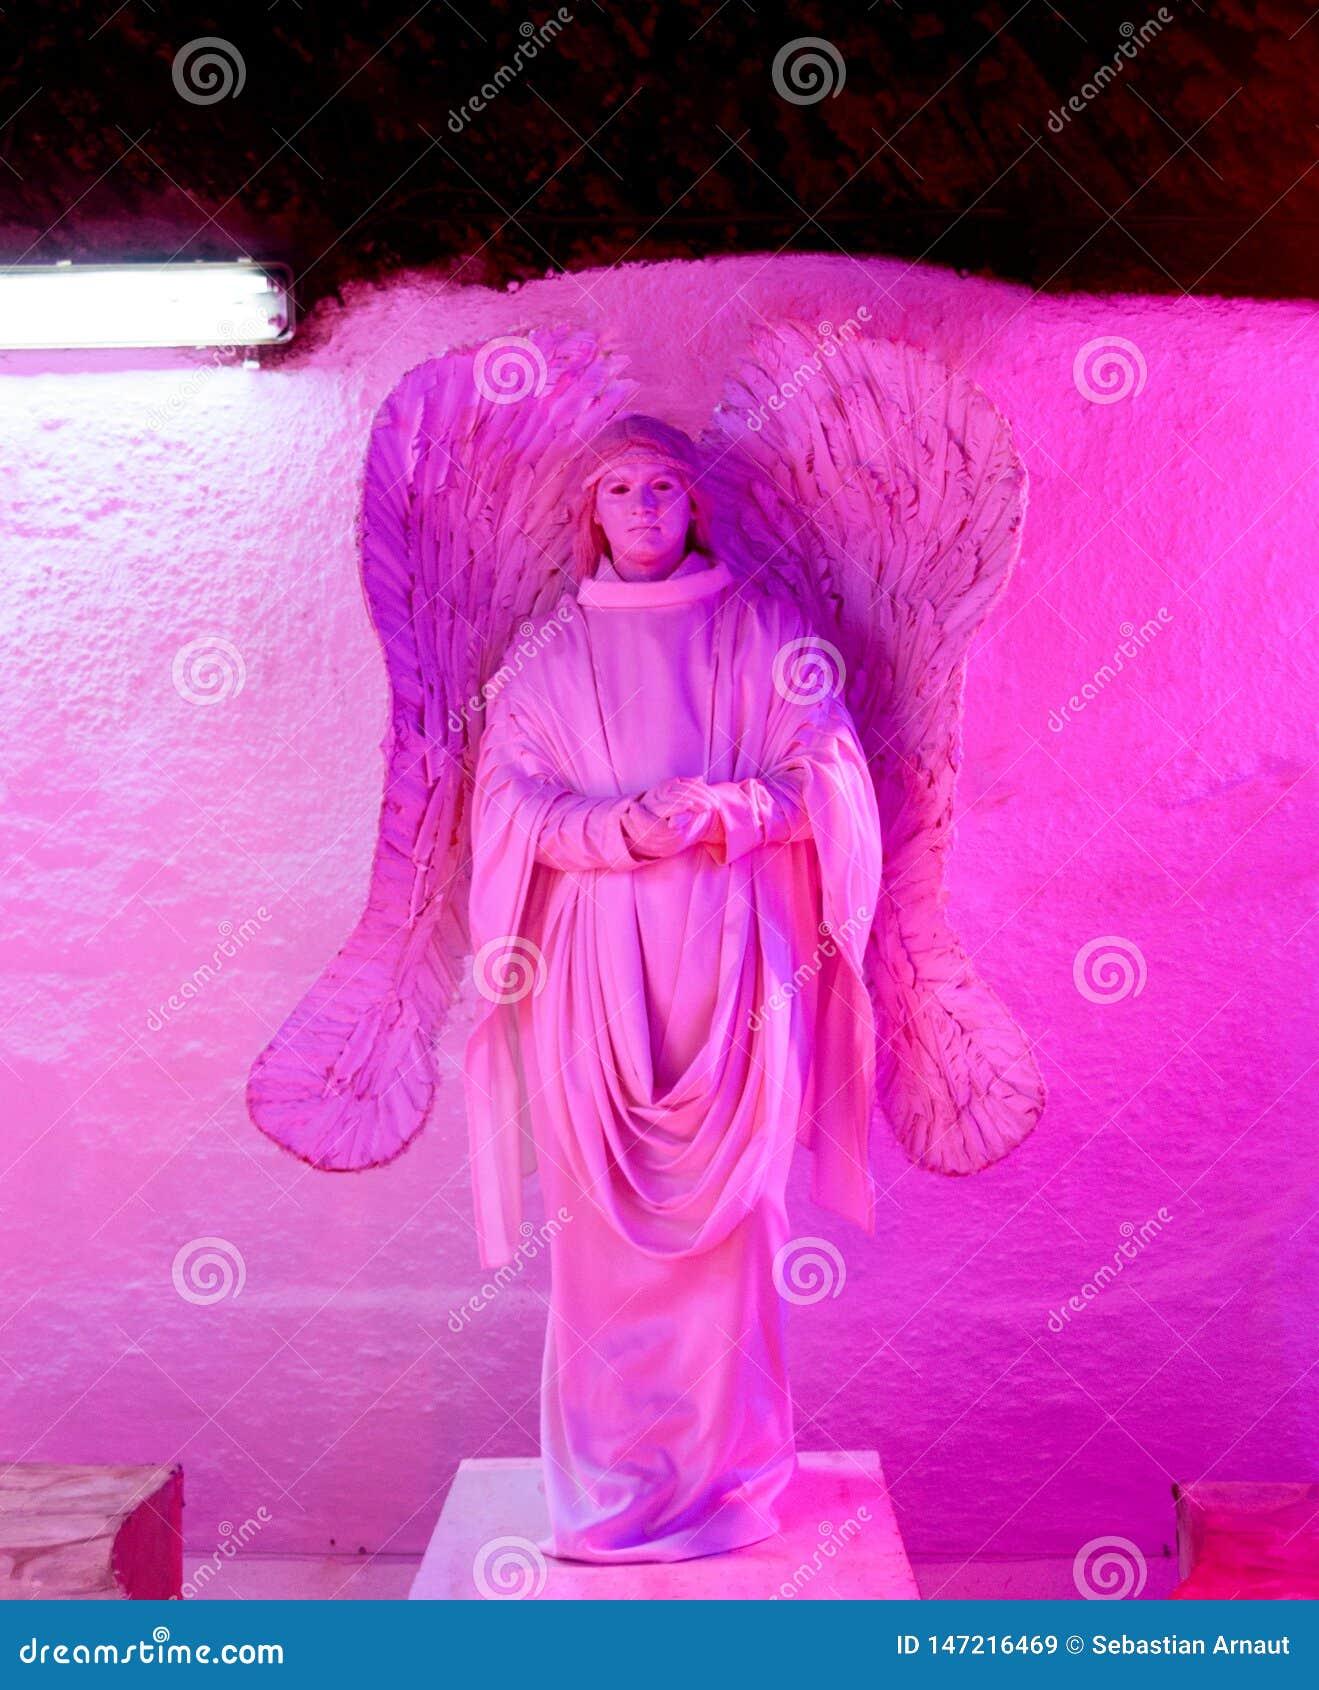 Large gypsum sculpture of an angel